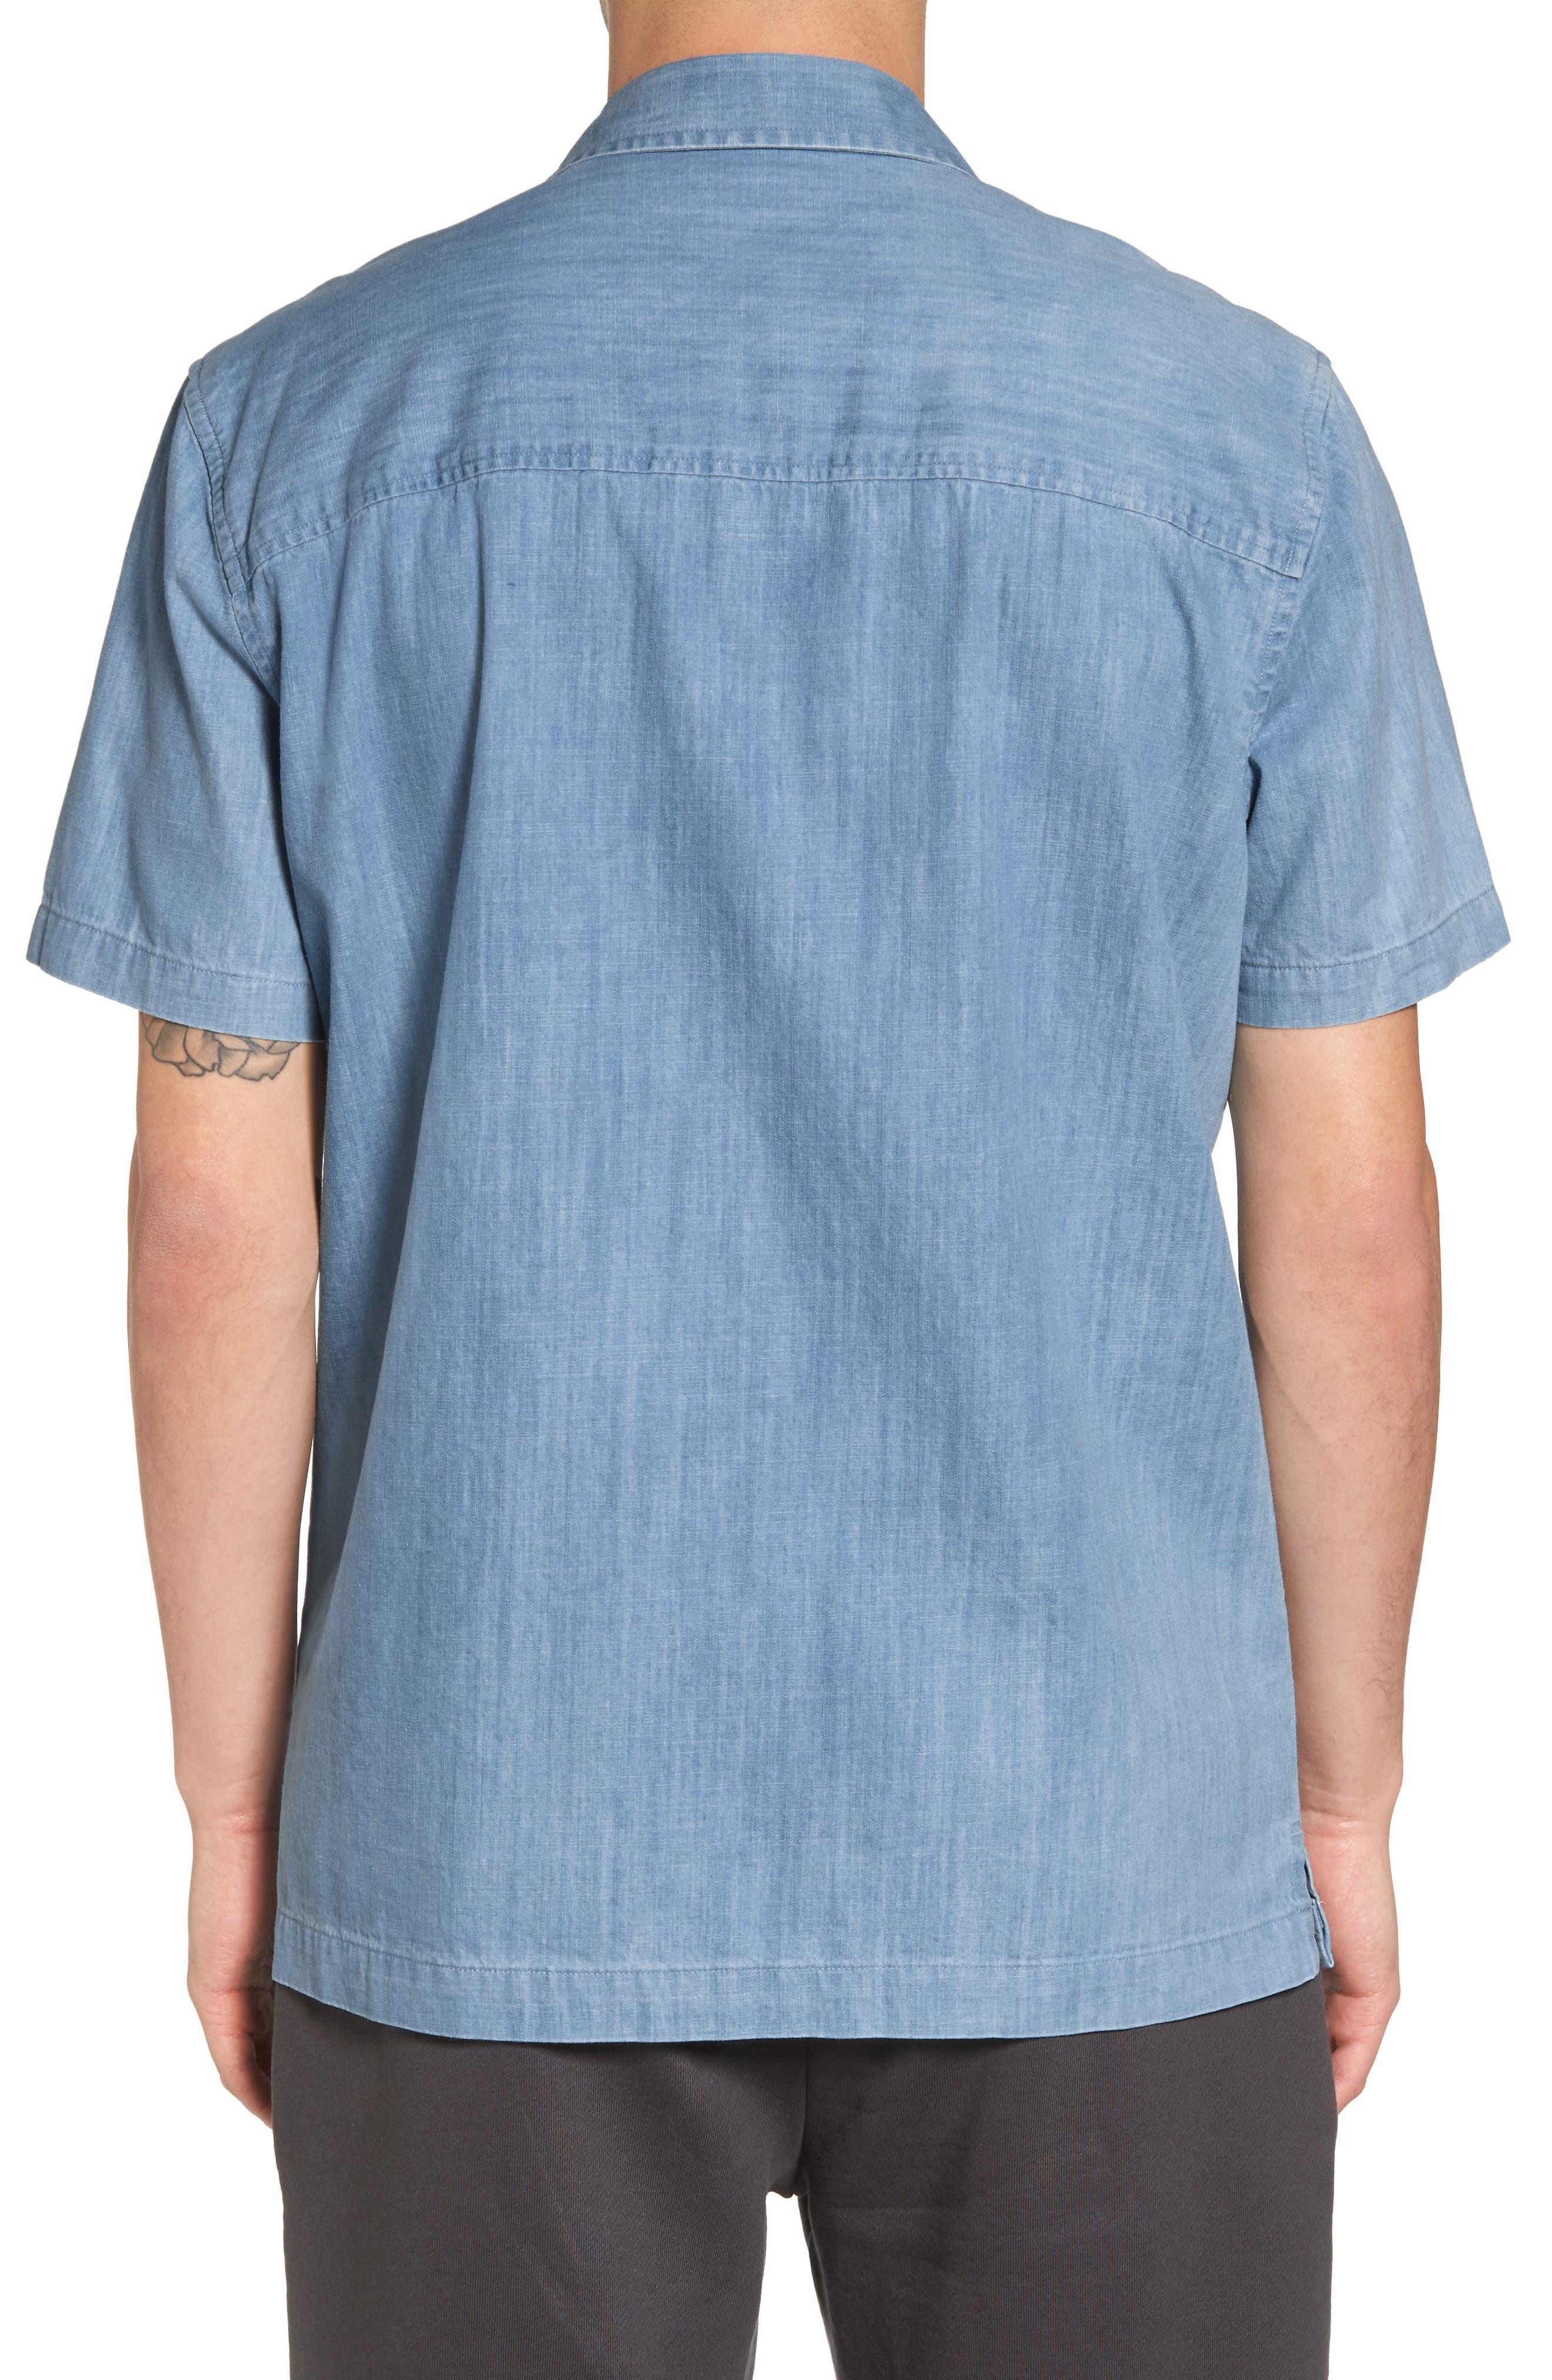 Nevin Short Sleeve Denim Shirt,                             Alternate thumbnail 2, color,                             Polar Blue